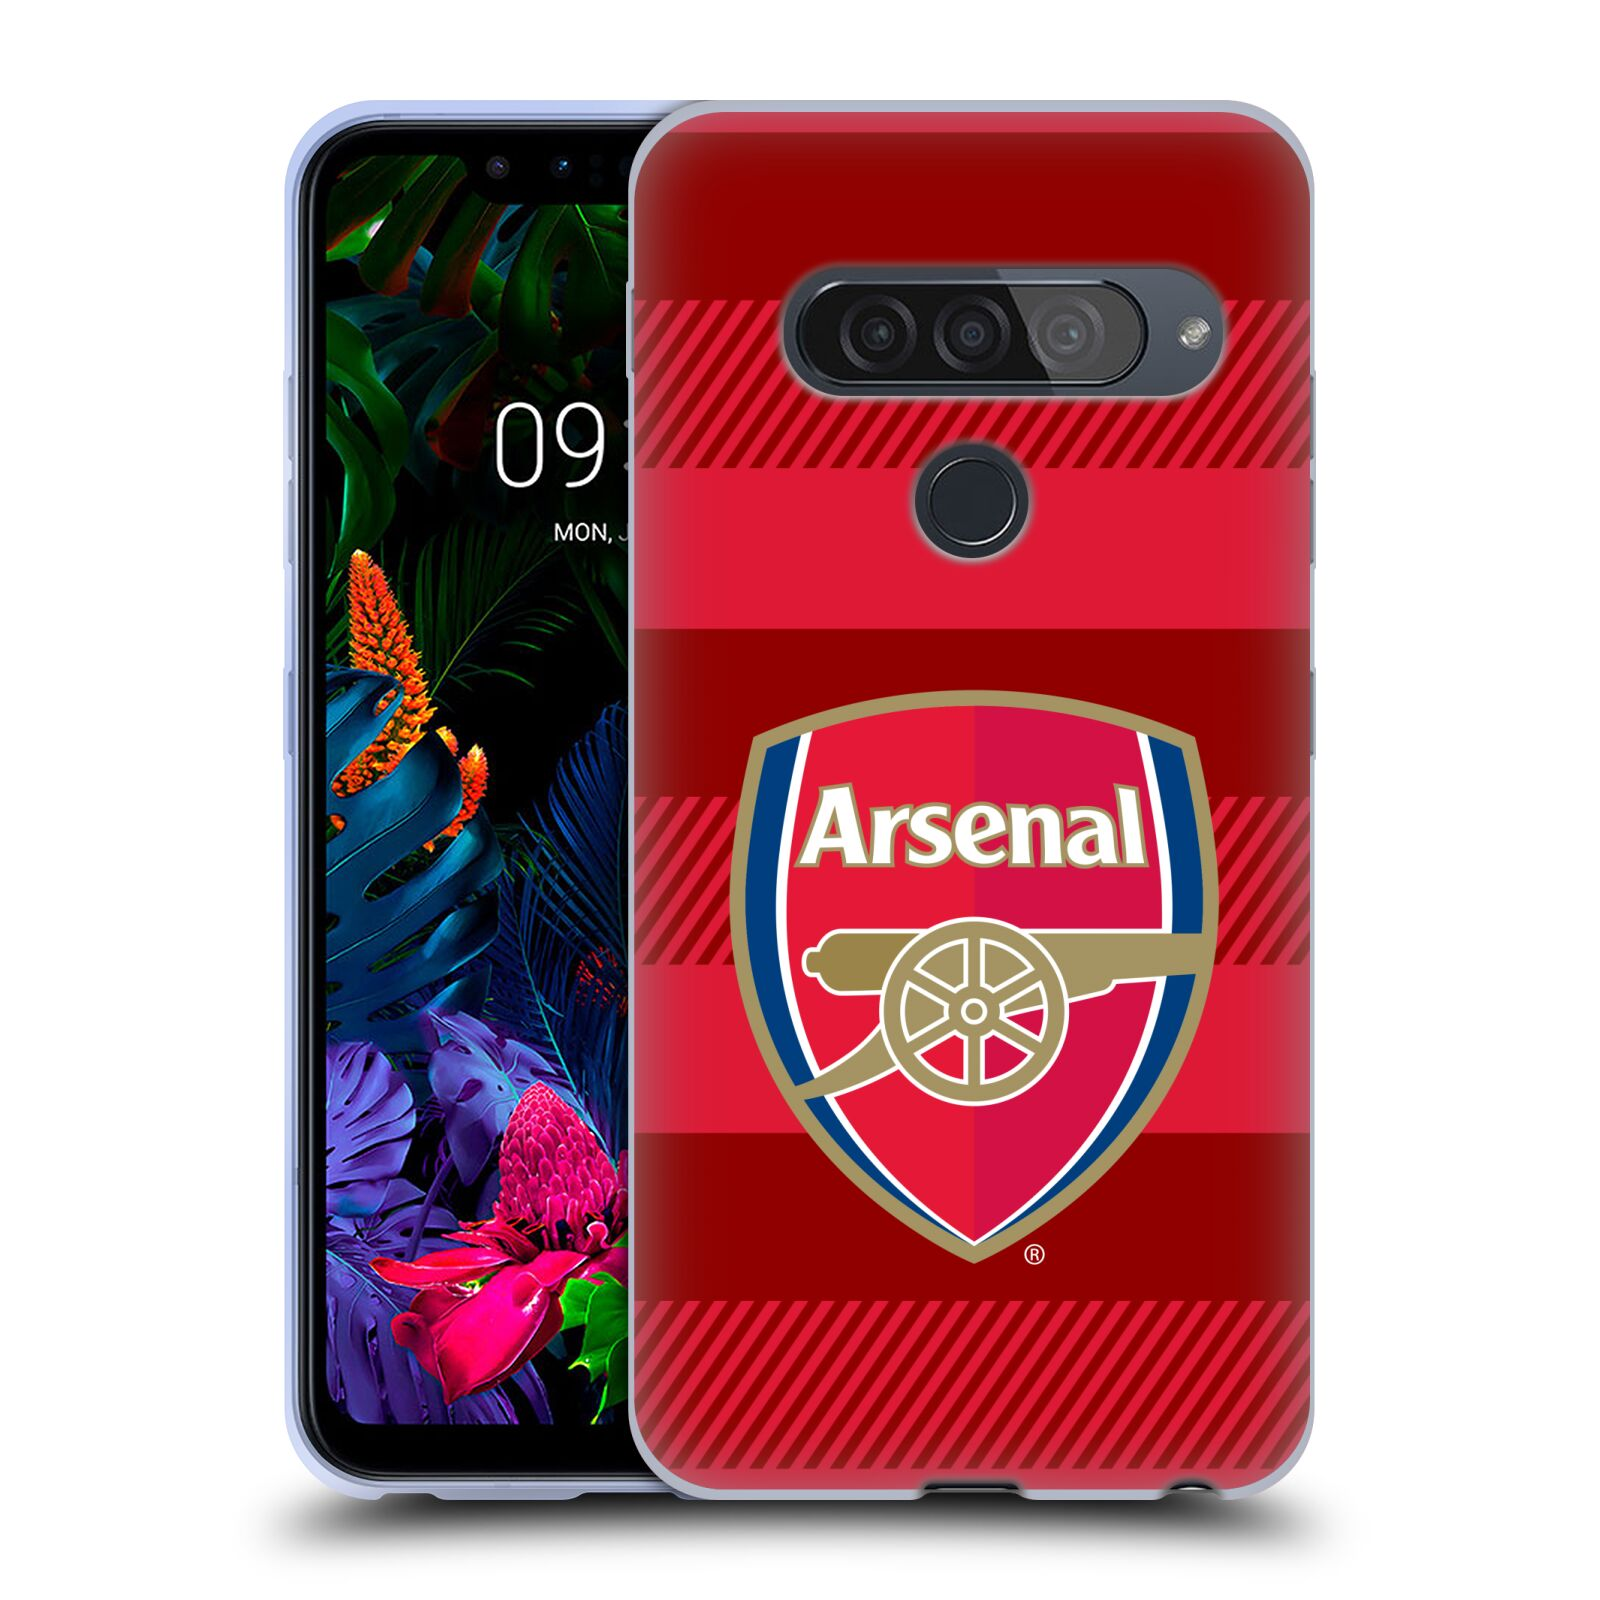 Silikonové pouzdro na mobil LG G8s ThinQ - Head Case - Arsenal FC - Logo s pruhy